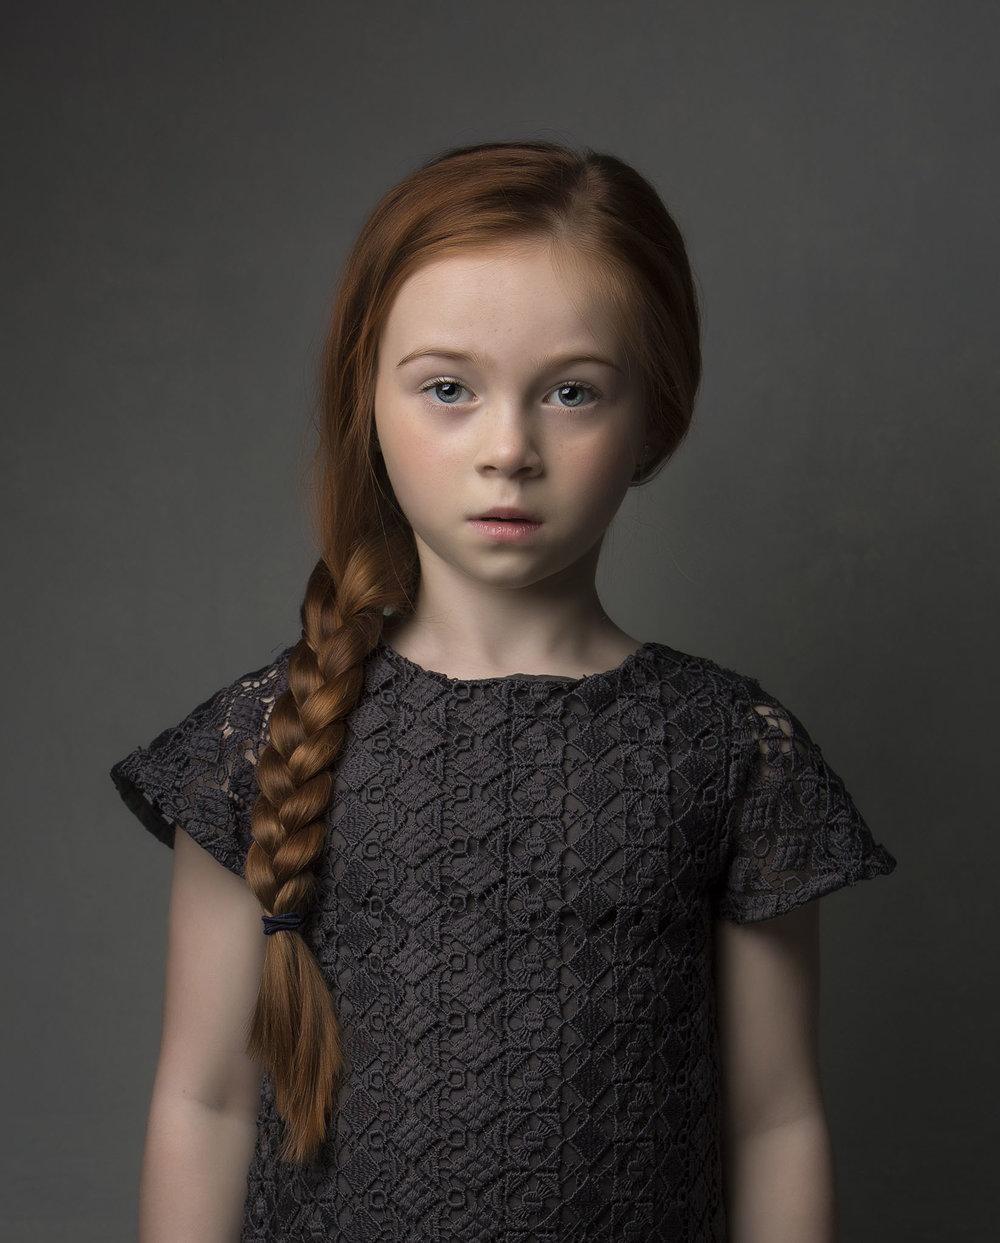 elizabethgphotography_kingslangley_hertfordshire_fineart_childrens_photography_30.jpg